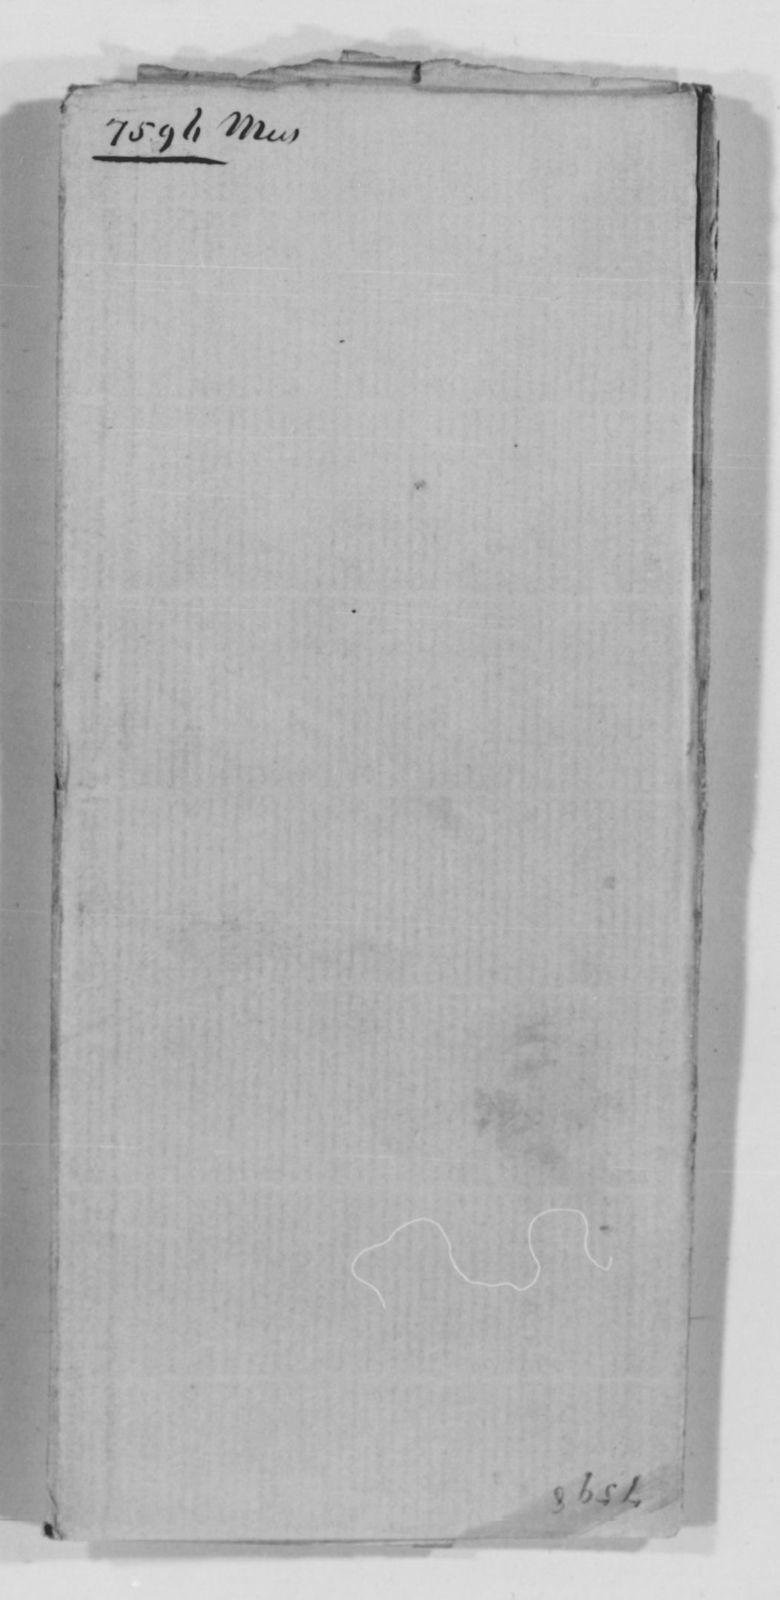 Confederate States of America records: Microfilm Reel 57